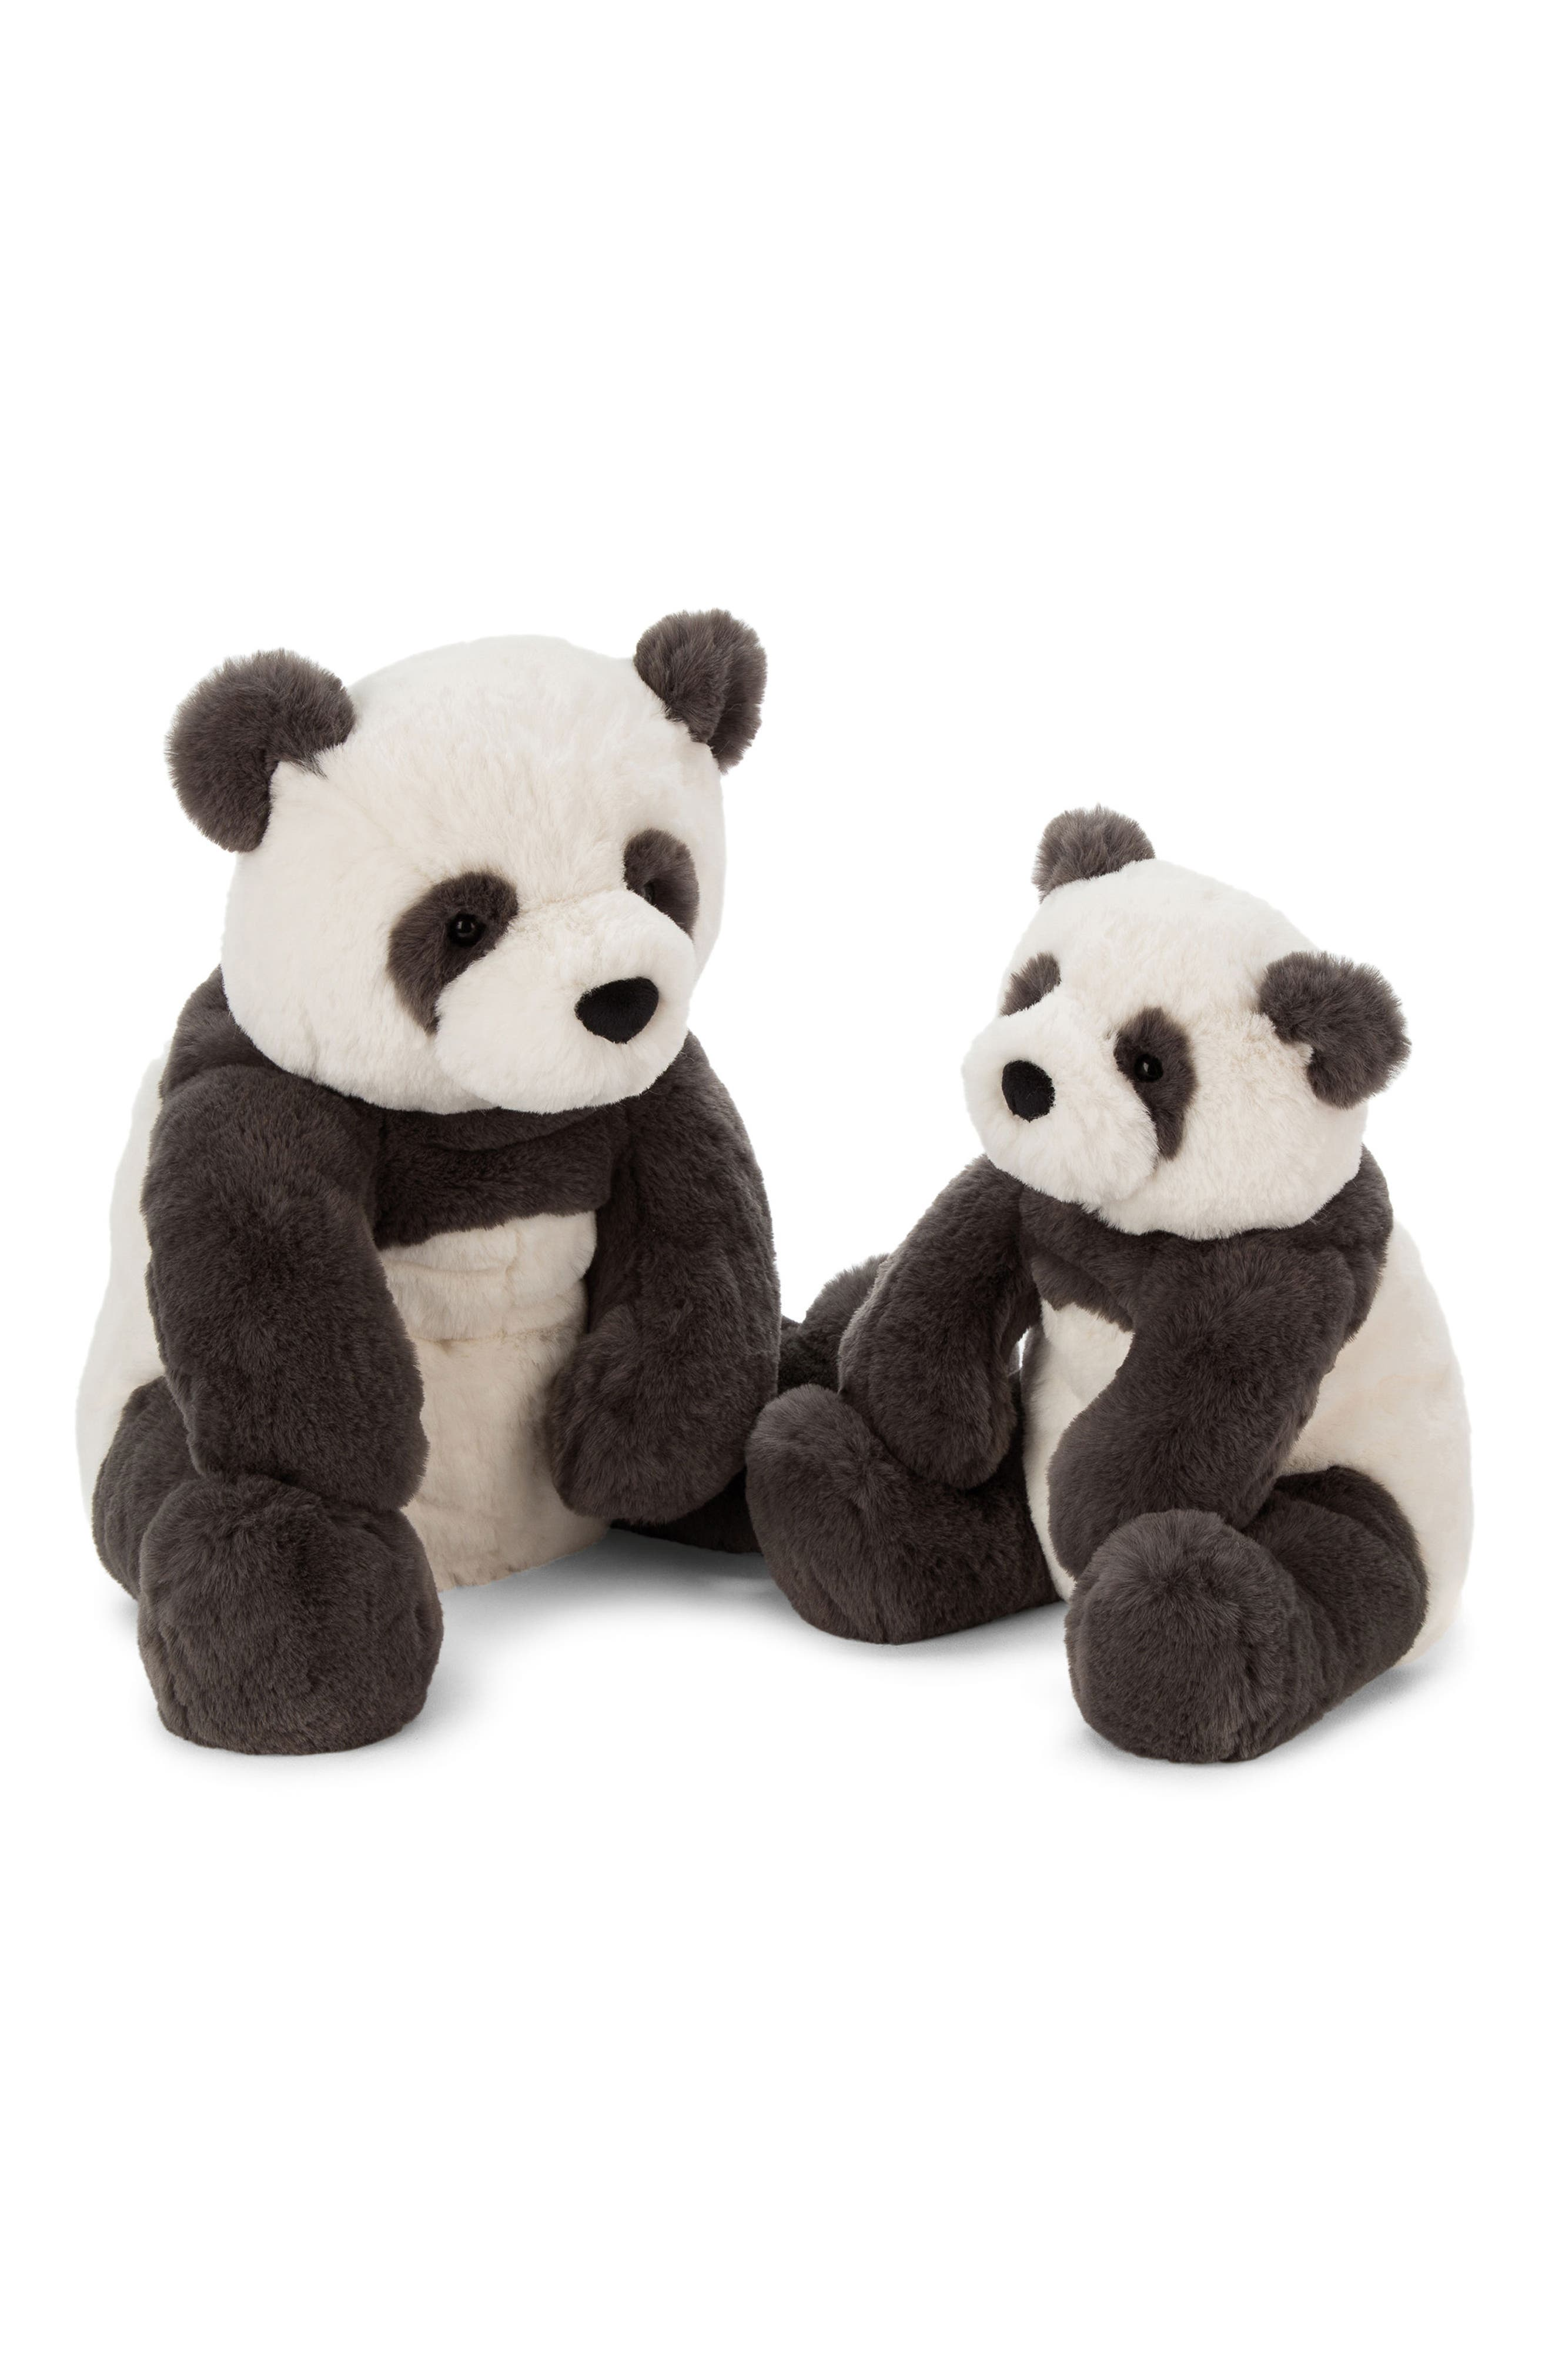 Large Harry Panda Stuffed Animal,                             Alternate thumbnail 2, color,                             BLACK / CREAM